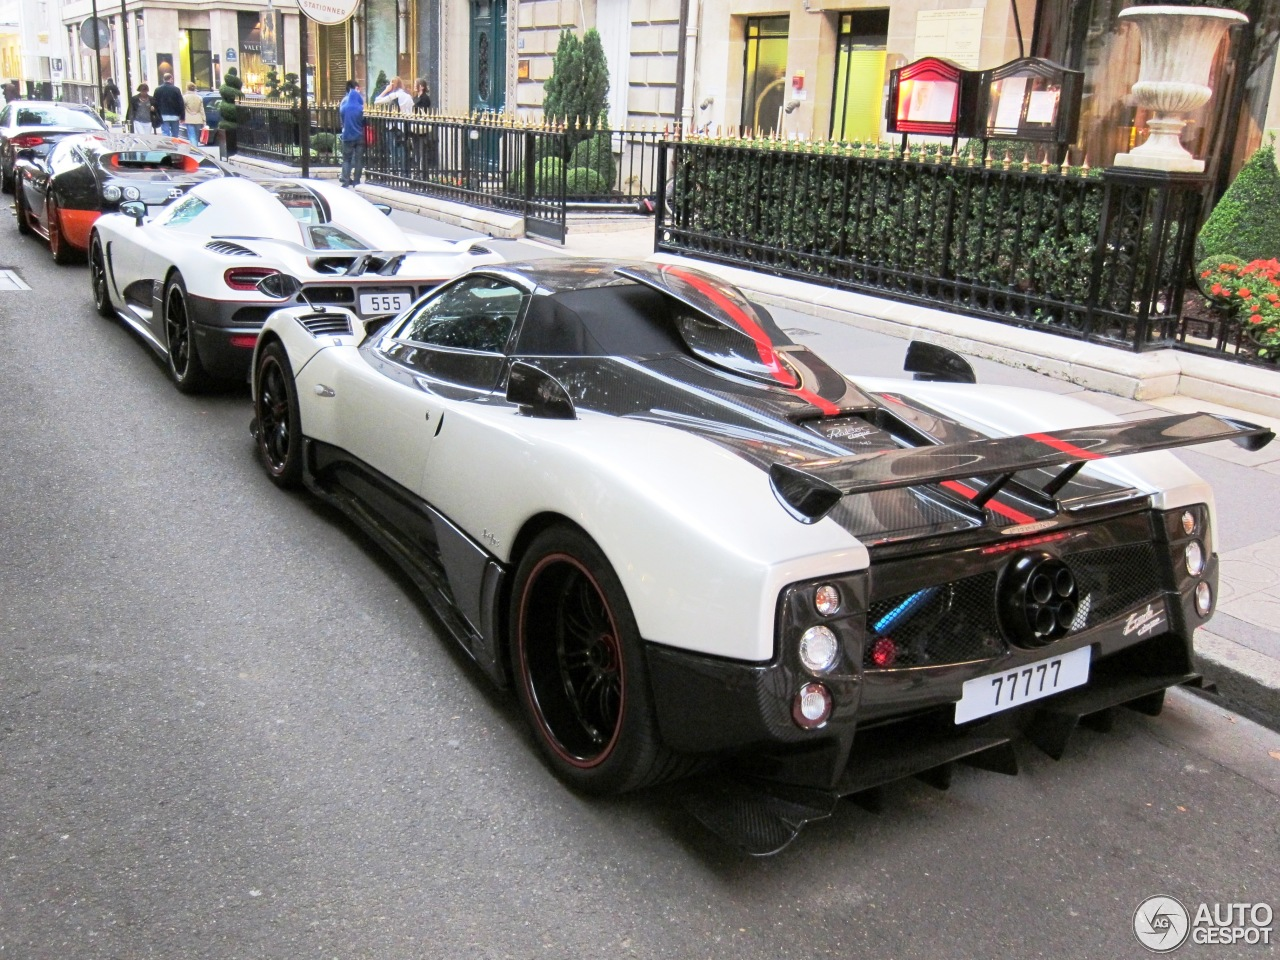 Pagani Zonda Cinque Roadster - 1 February 2013 - Auspot